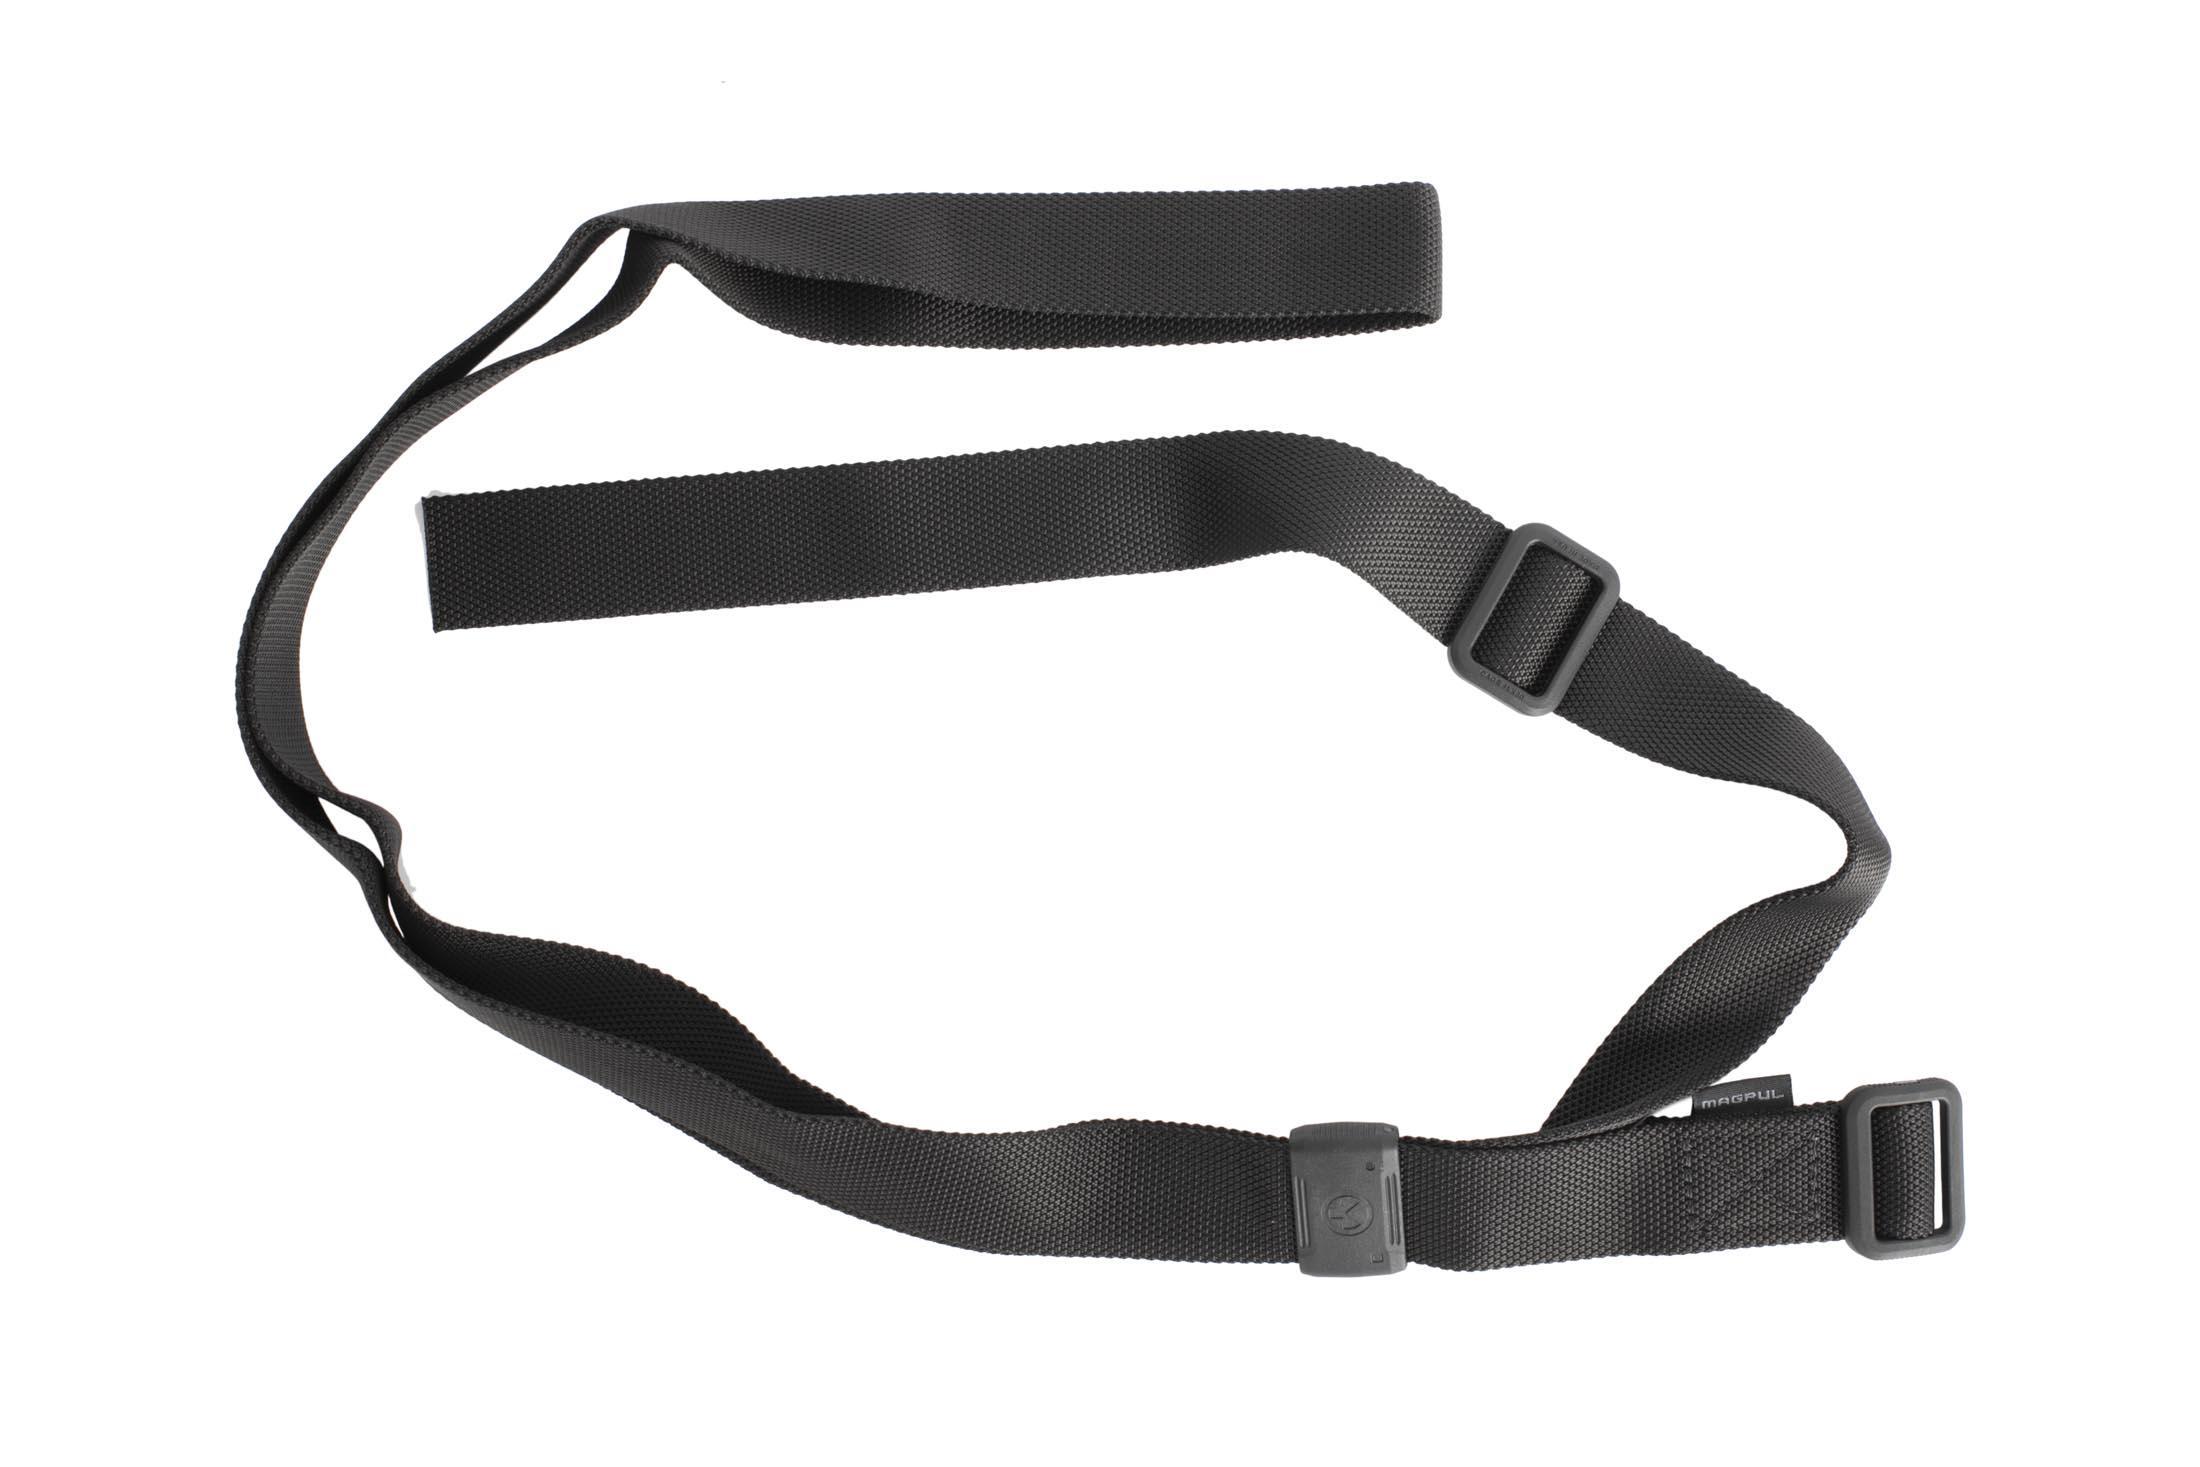 ar15 sling